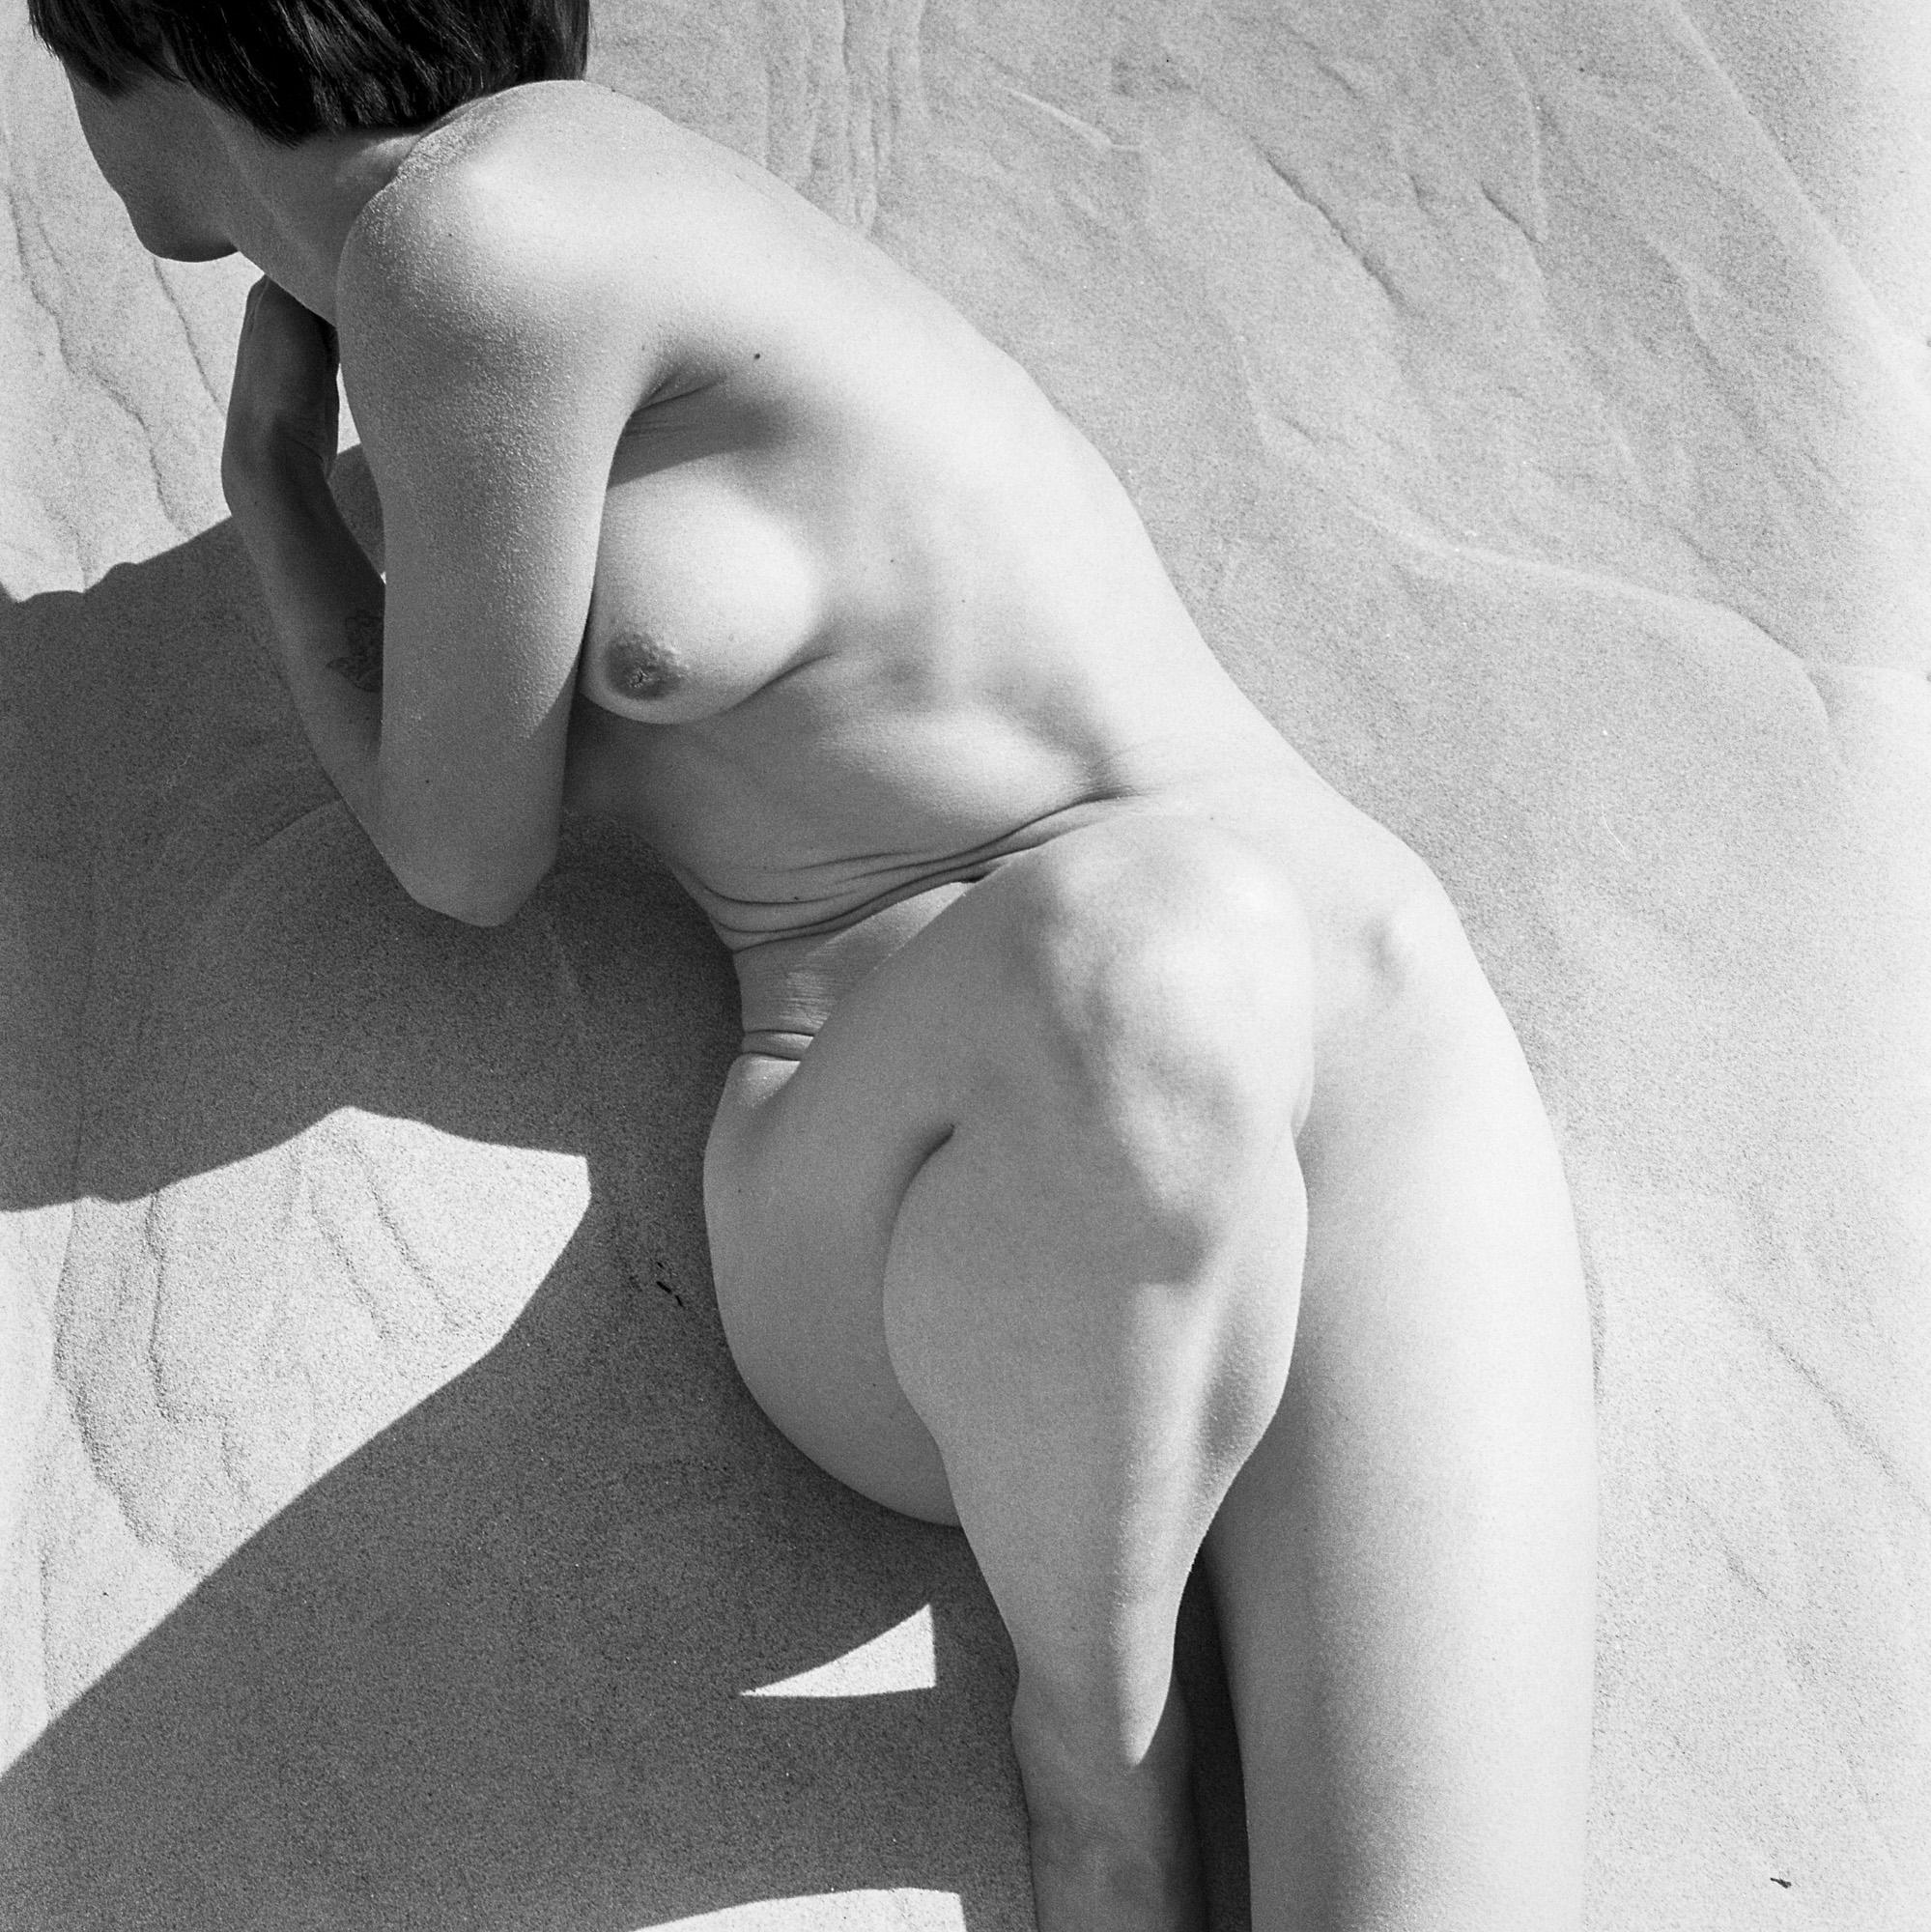 Henrikson Archive Nudes web_31.jpg